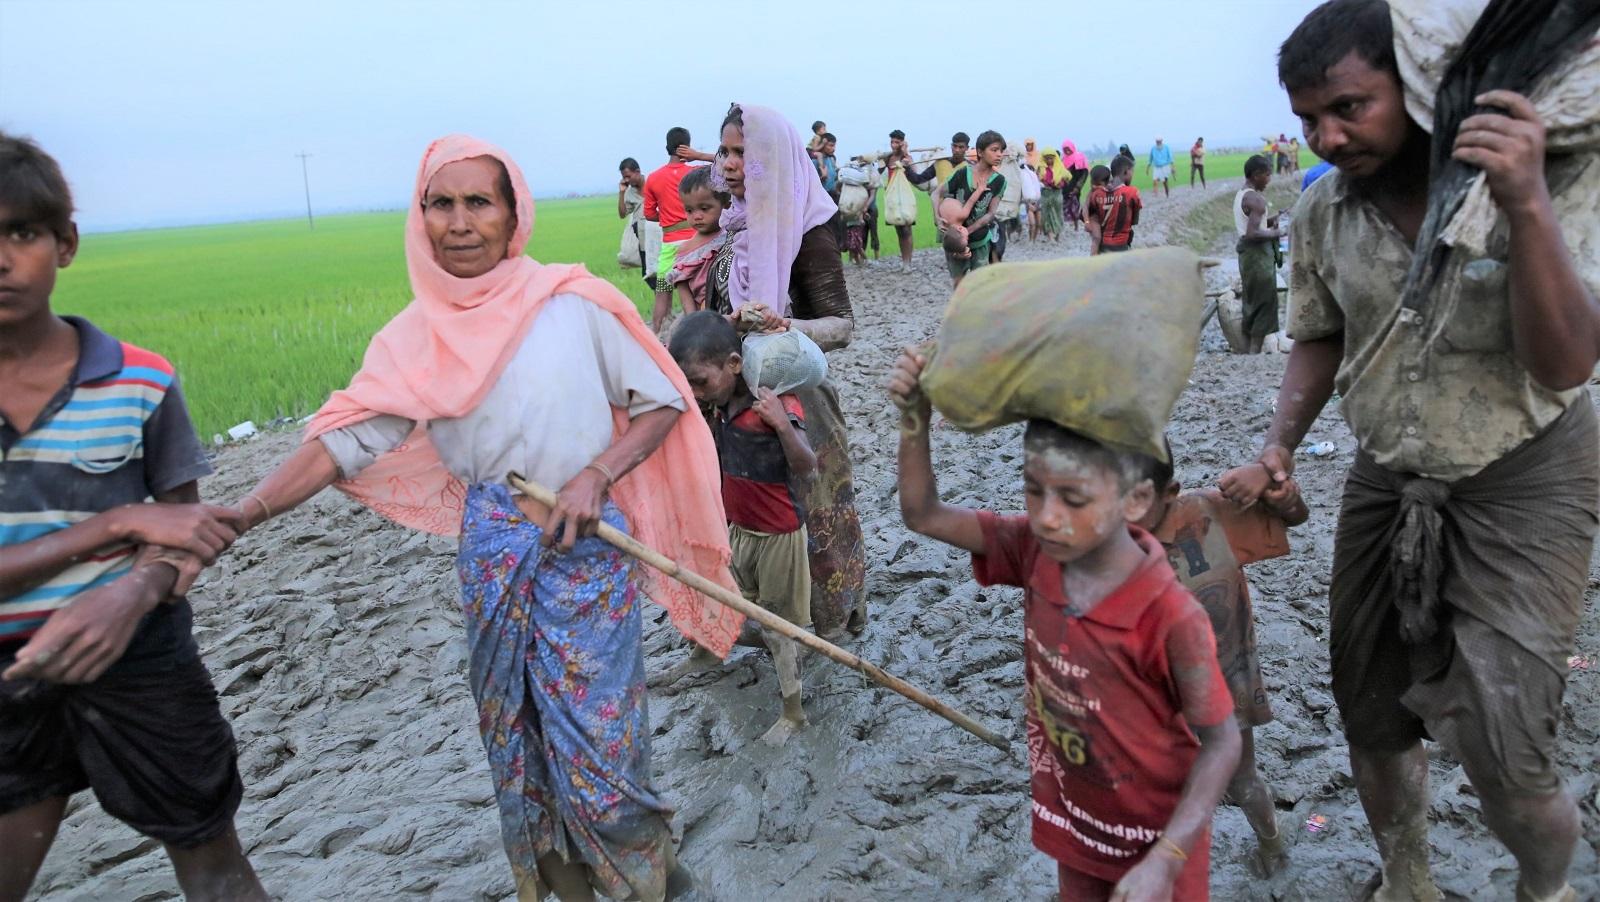 Rohingya refugees from Rakhine state in Myanmar near Teknaf in Bangladesh on Sunday. (Photo: Zakir Hossain Chowdhury/Getty Images)